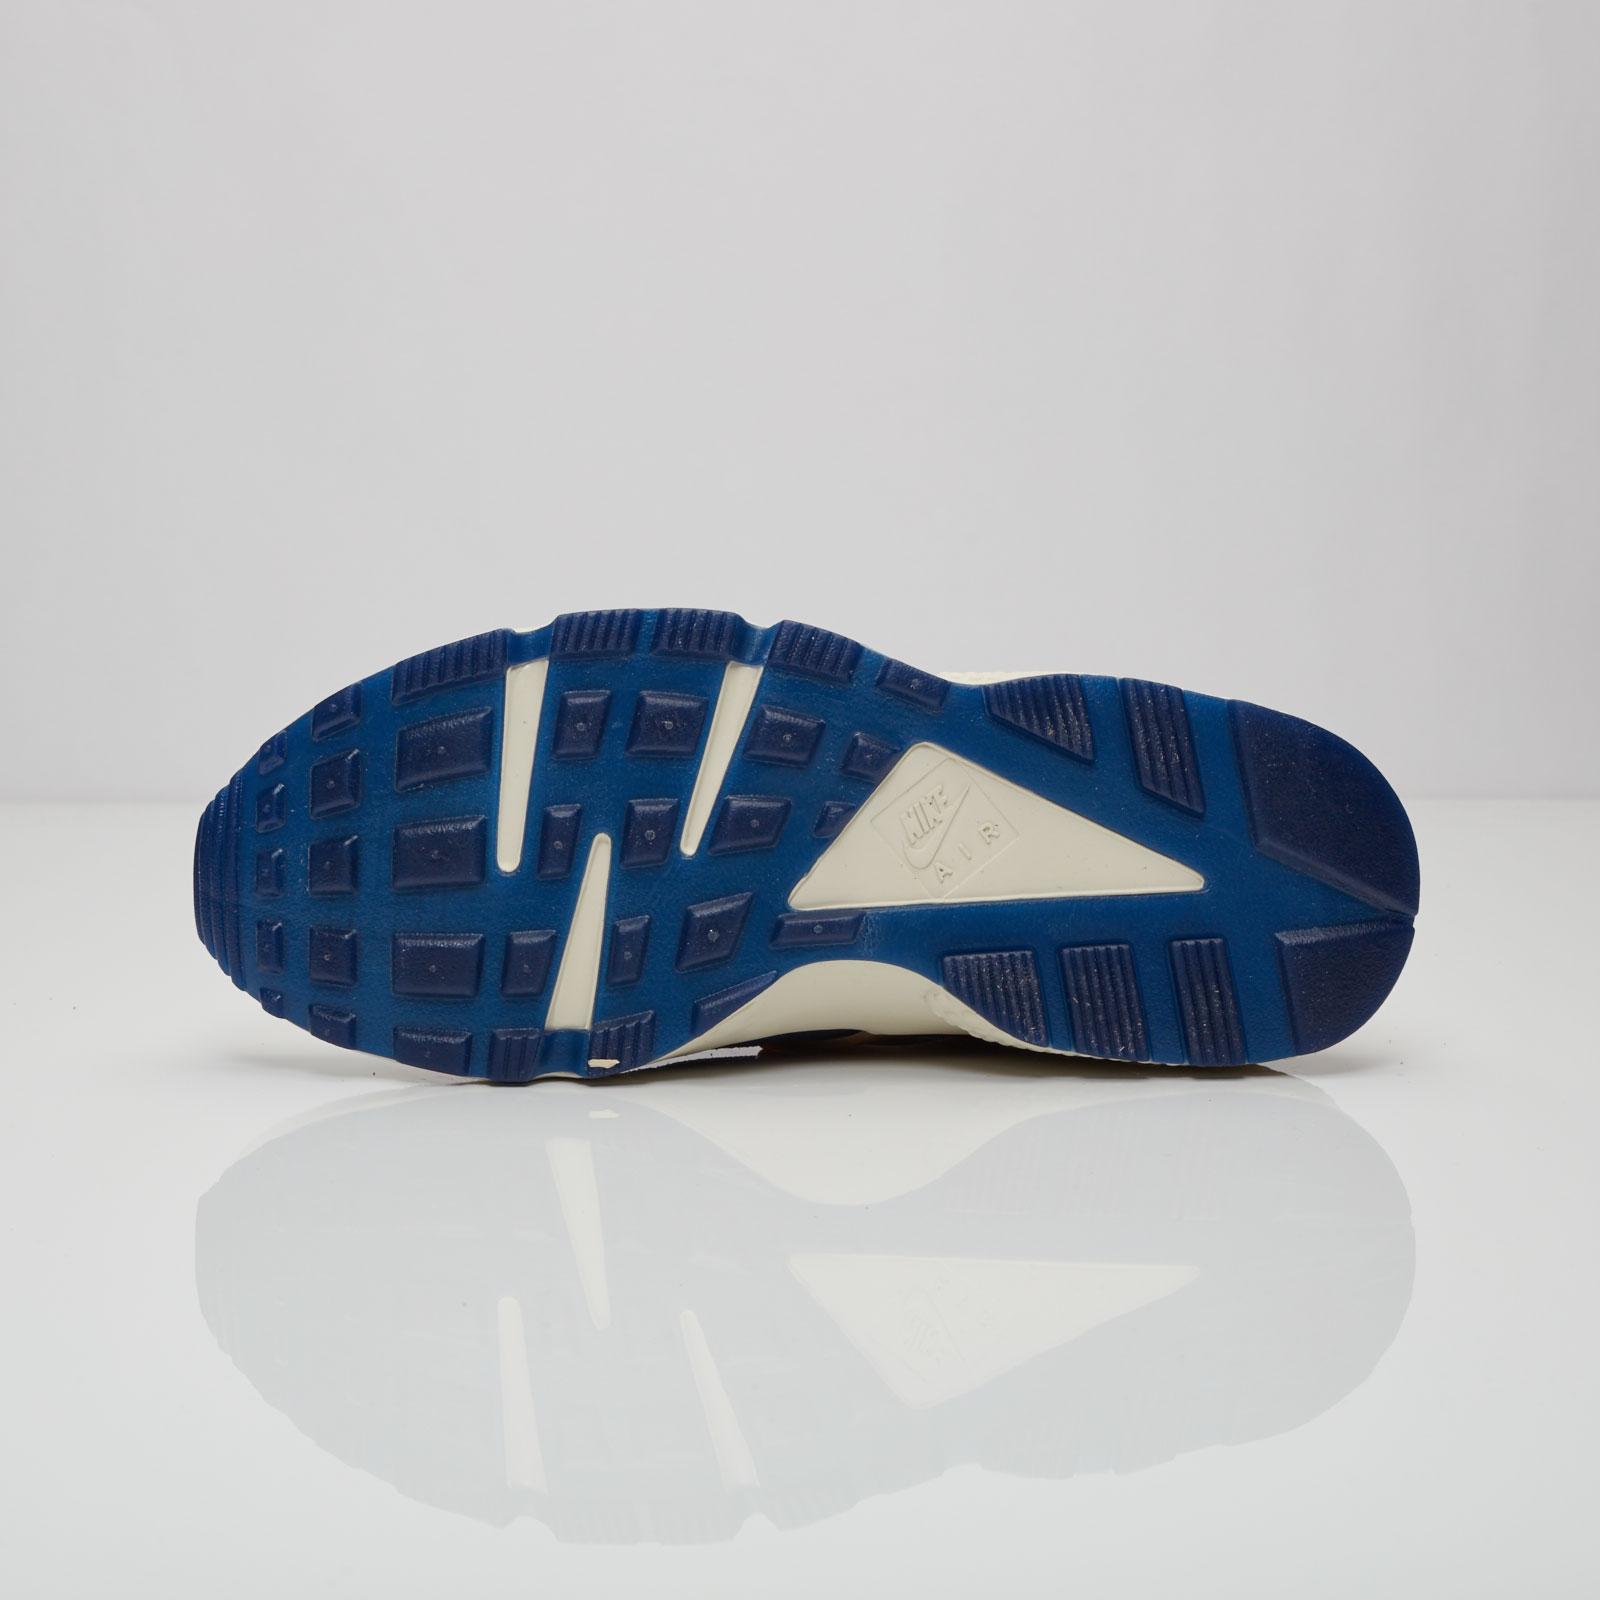 premium selection 27287 30890 Nike Air Huarache Run Premium - 704830-101 - Sneakersnstuff   sneakers    streetwear online since 1999